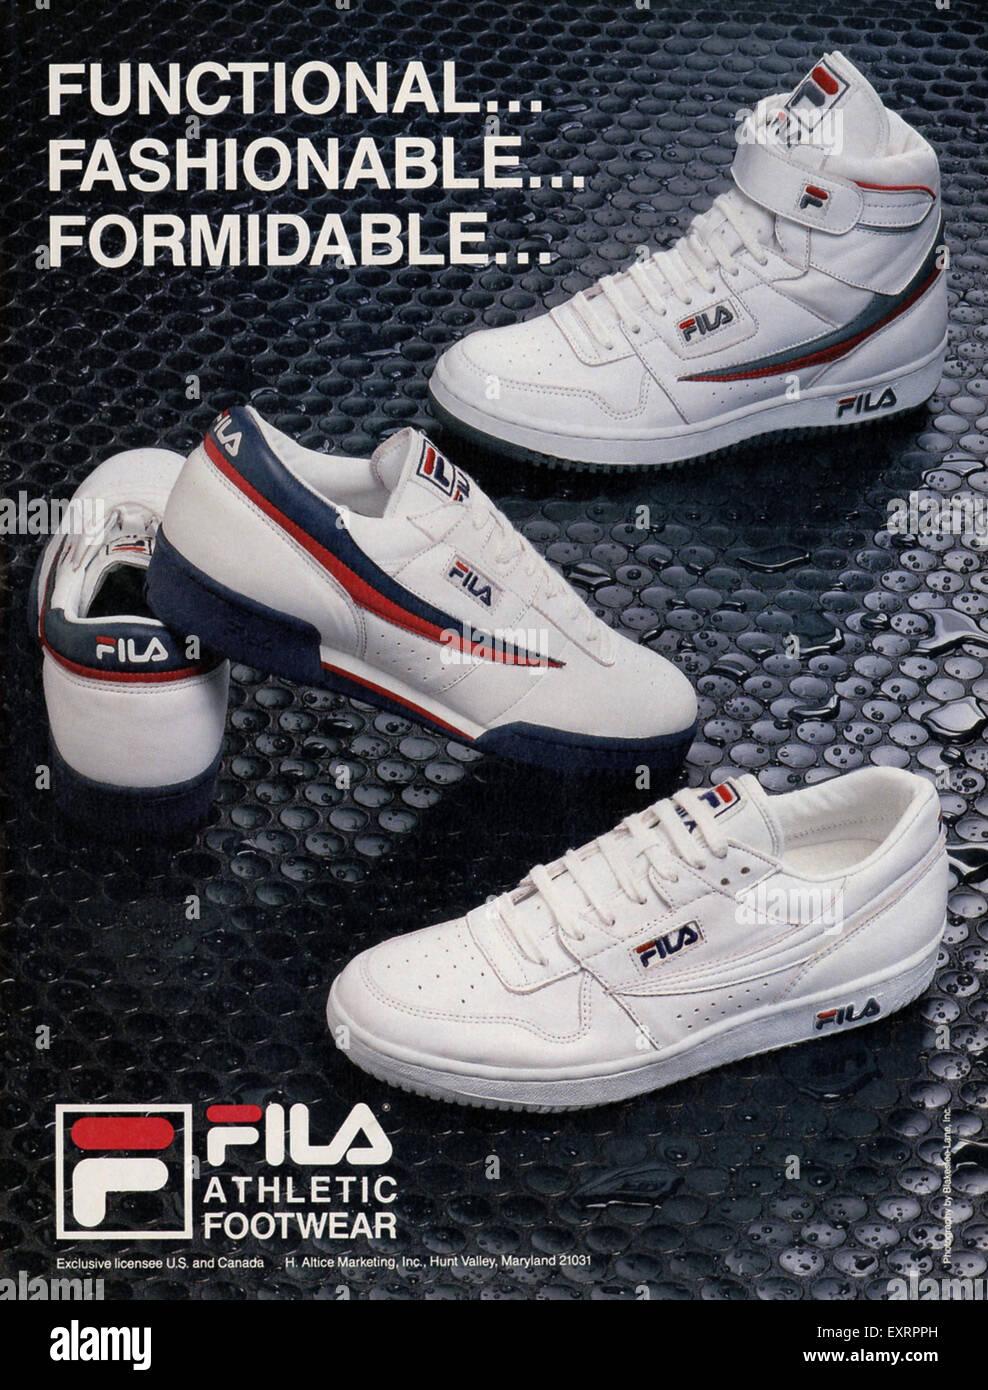 1980s USA Fila Magazine Advert - Stock Image